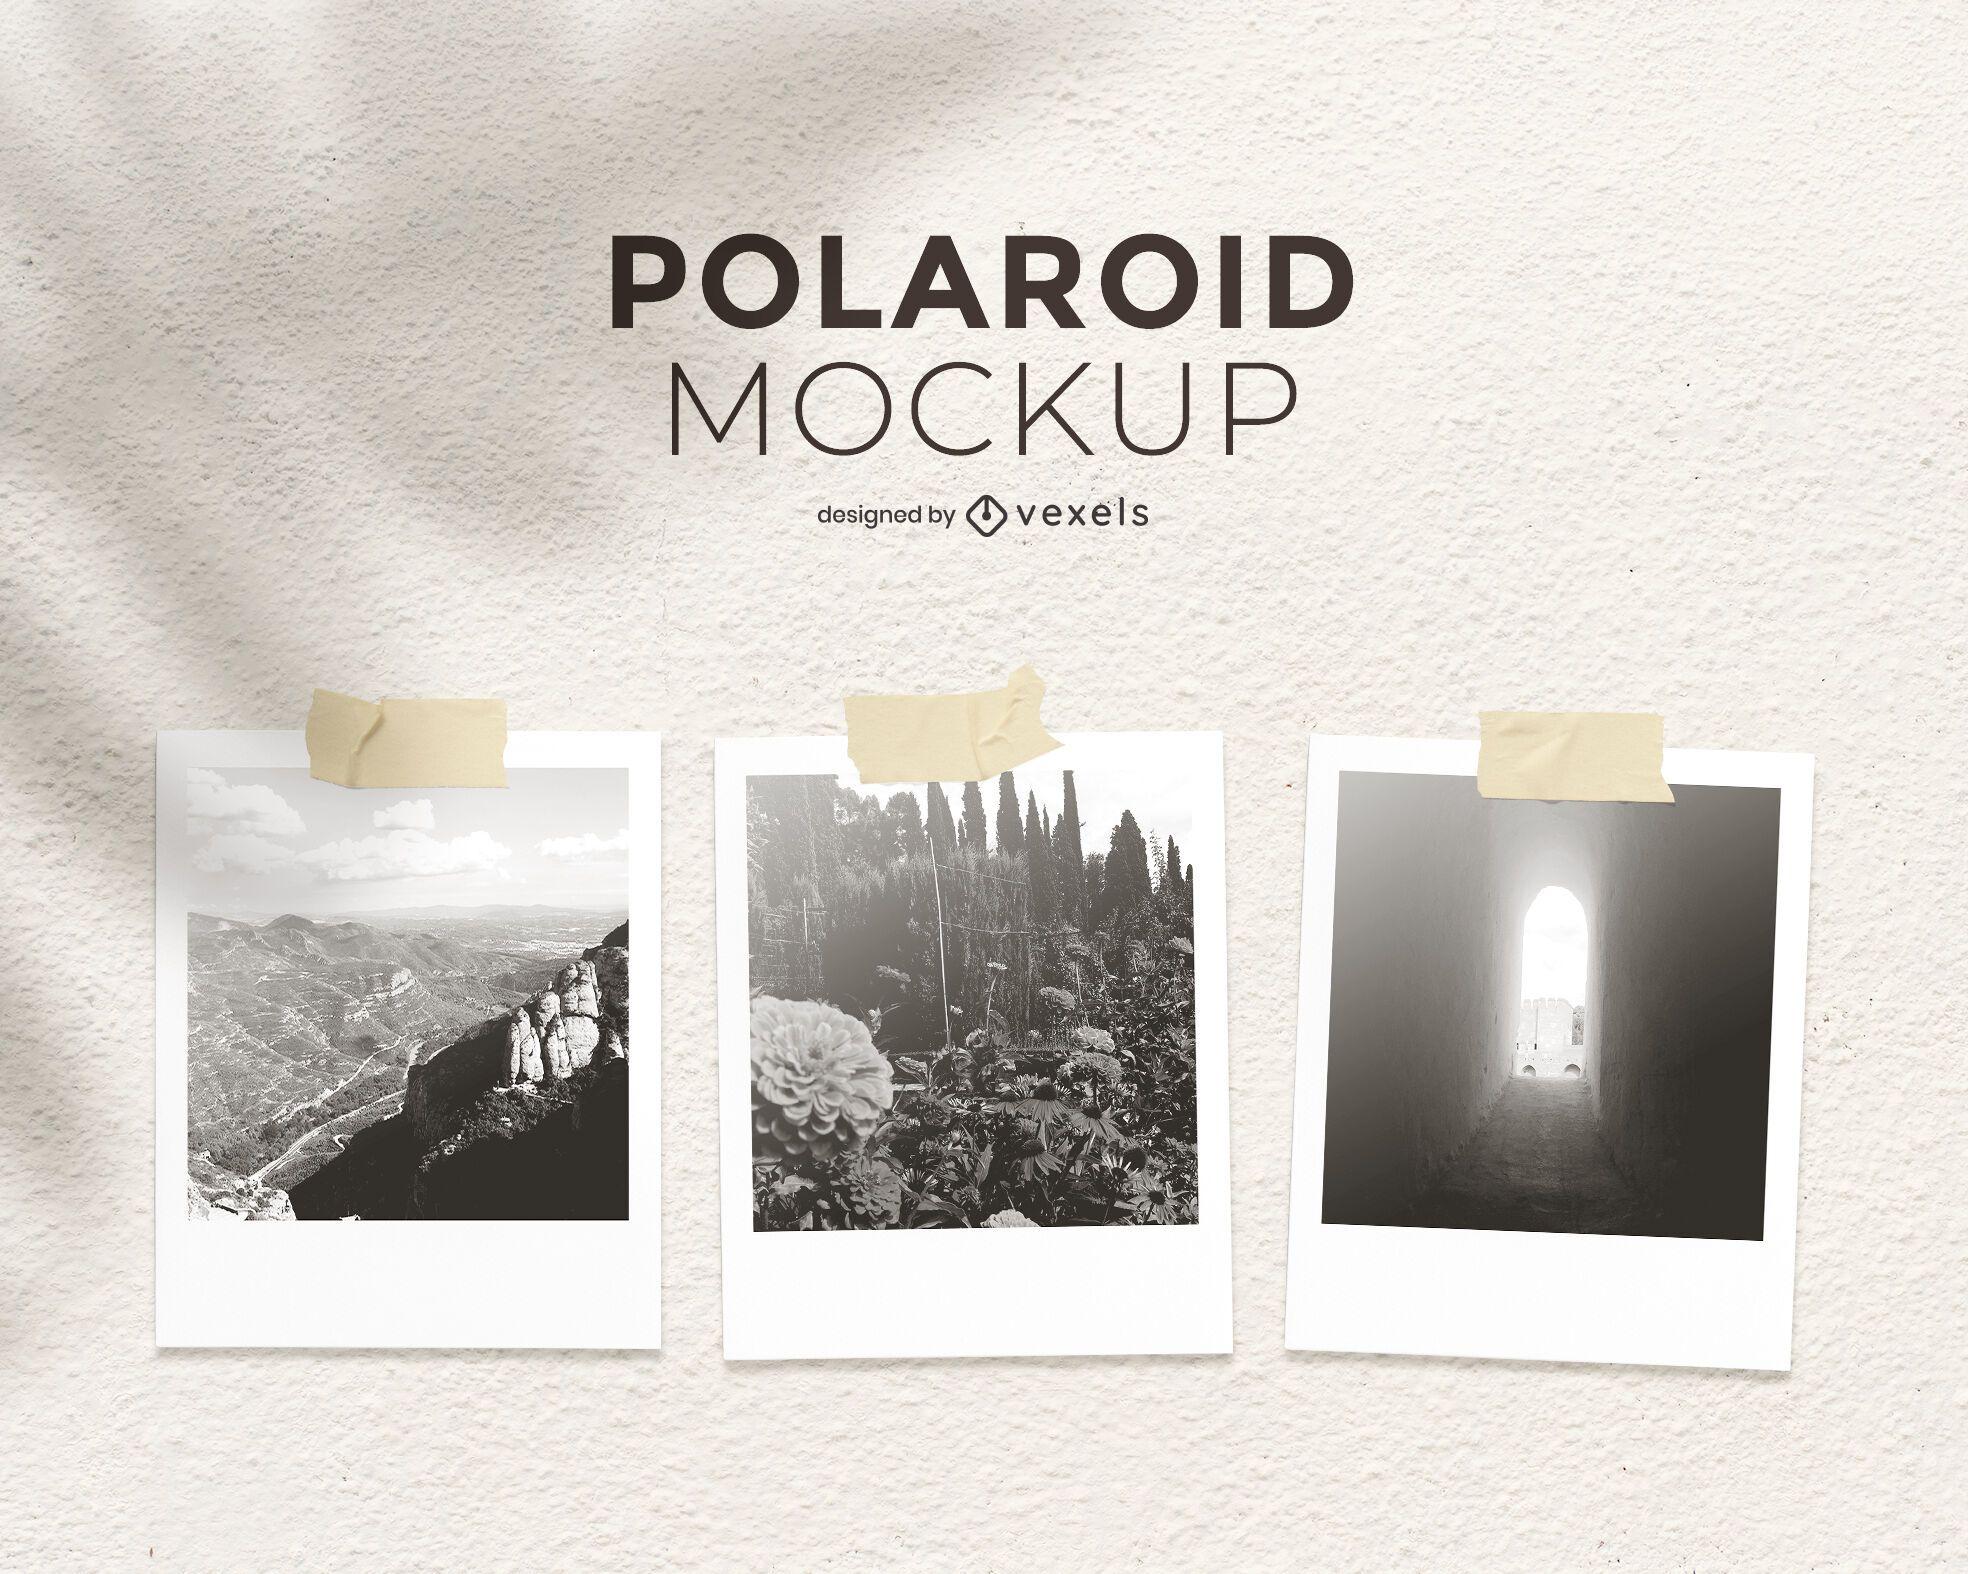 Polaroid Set Modell Design